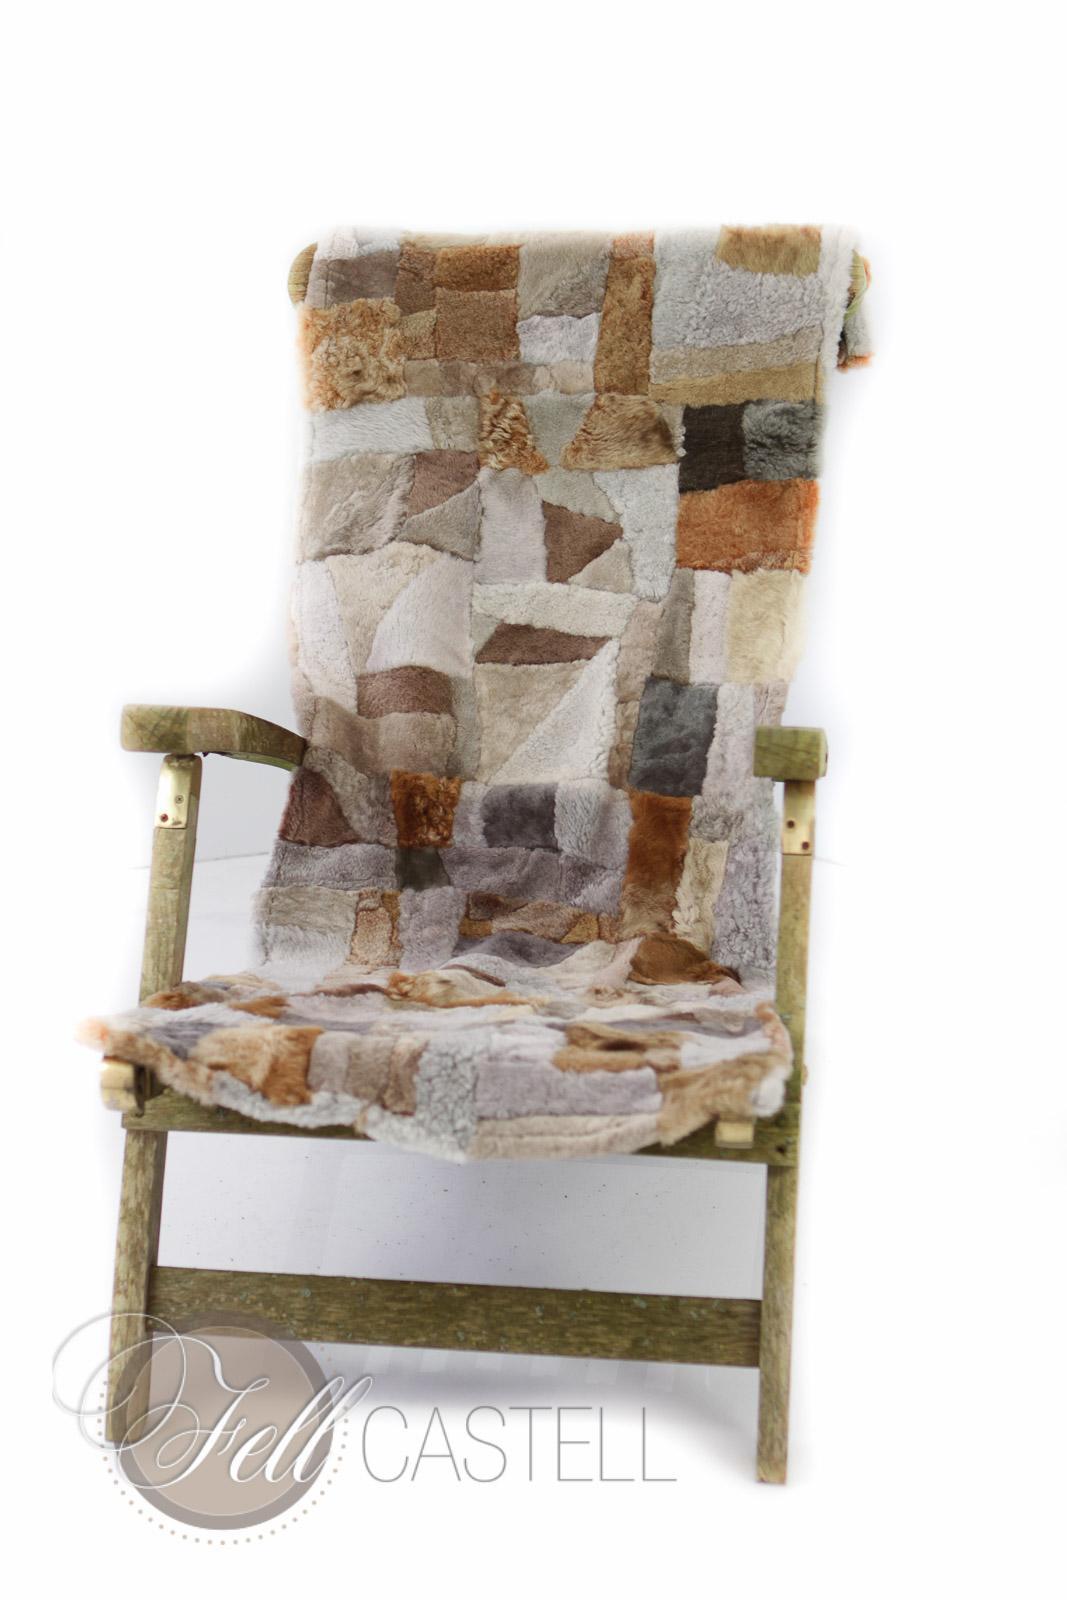 kleine lammfell decke 155x55 cm patchwork r ckseite leder multicolor lammfell schaffell shop. Black Bedroom Furniture Sets. Home Design Ideas